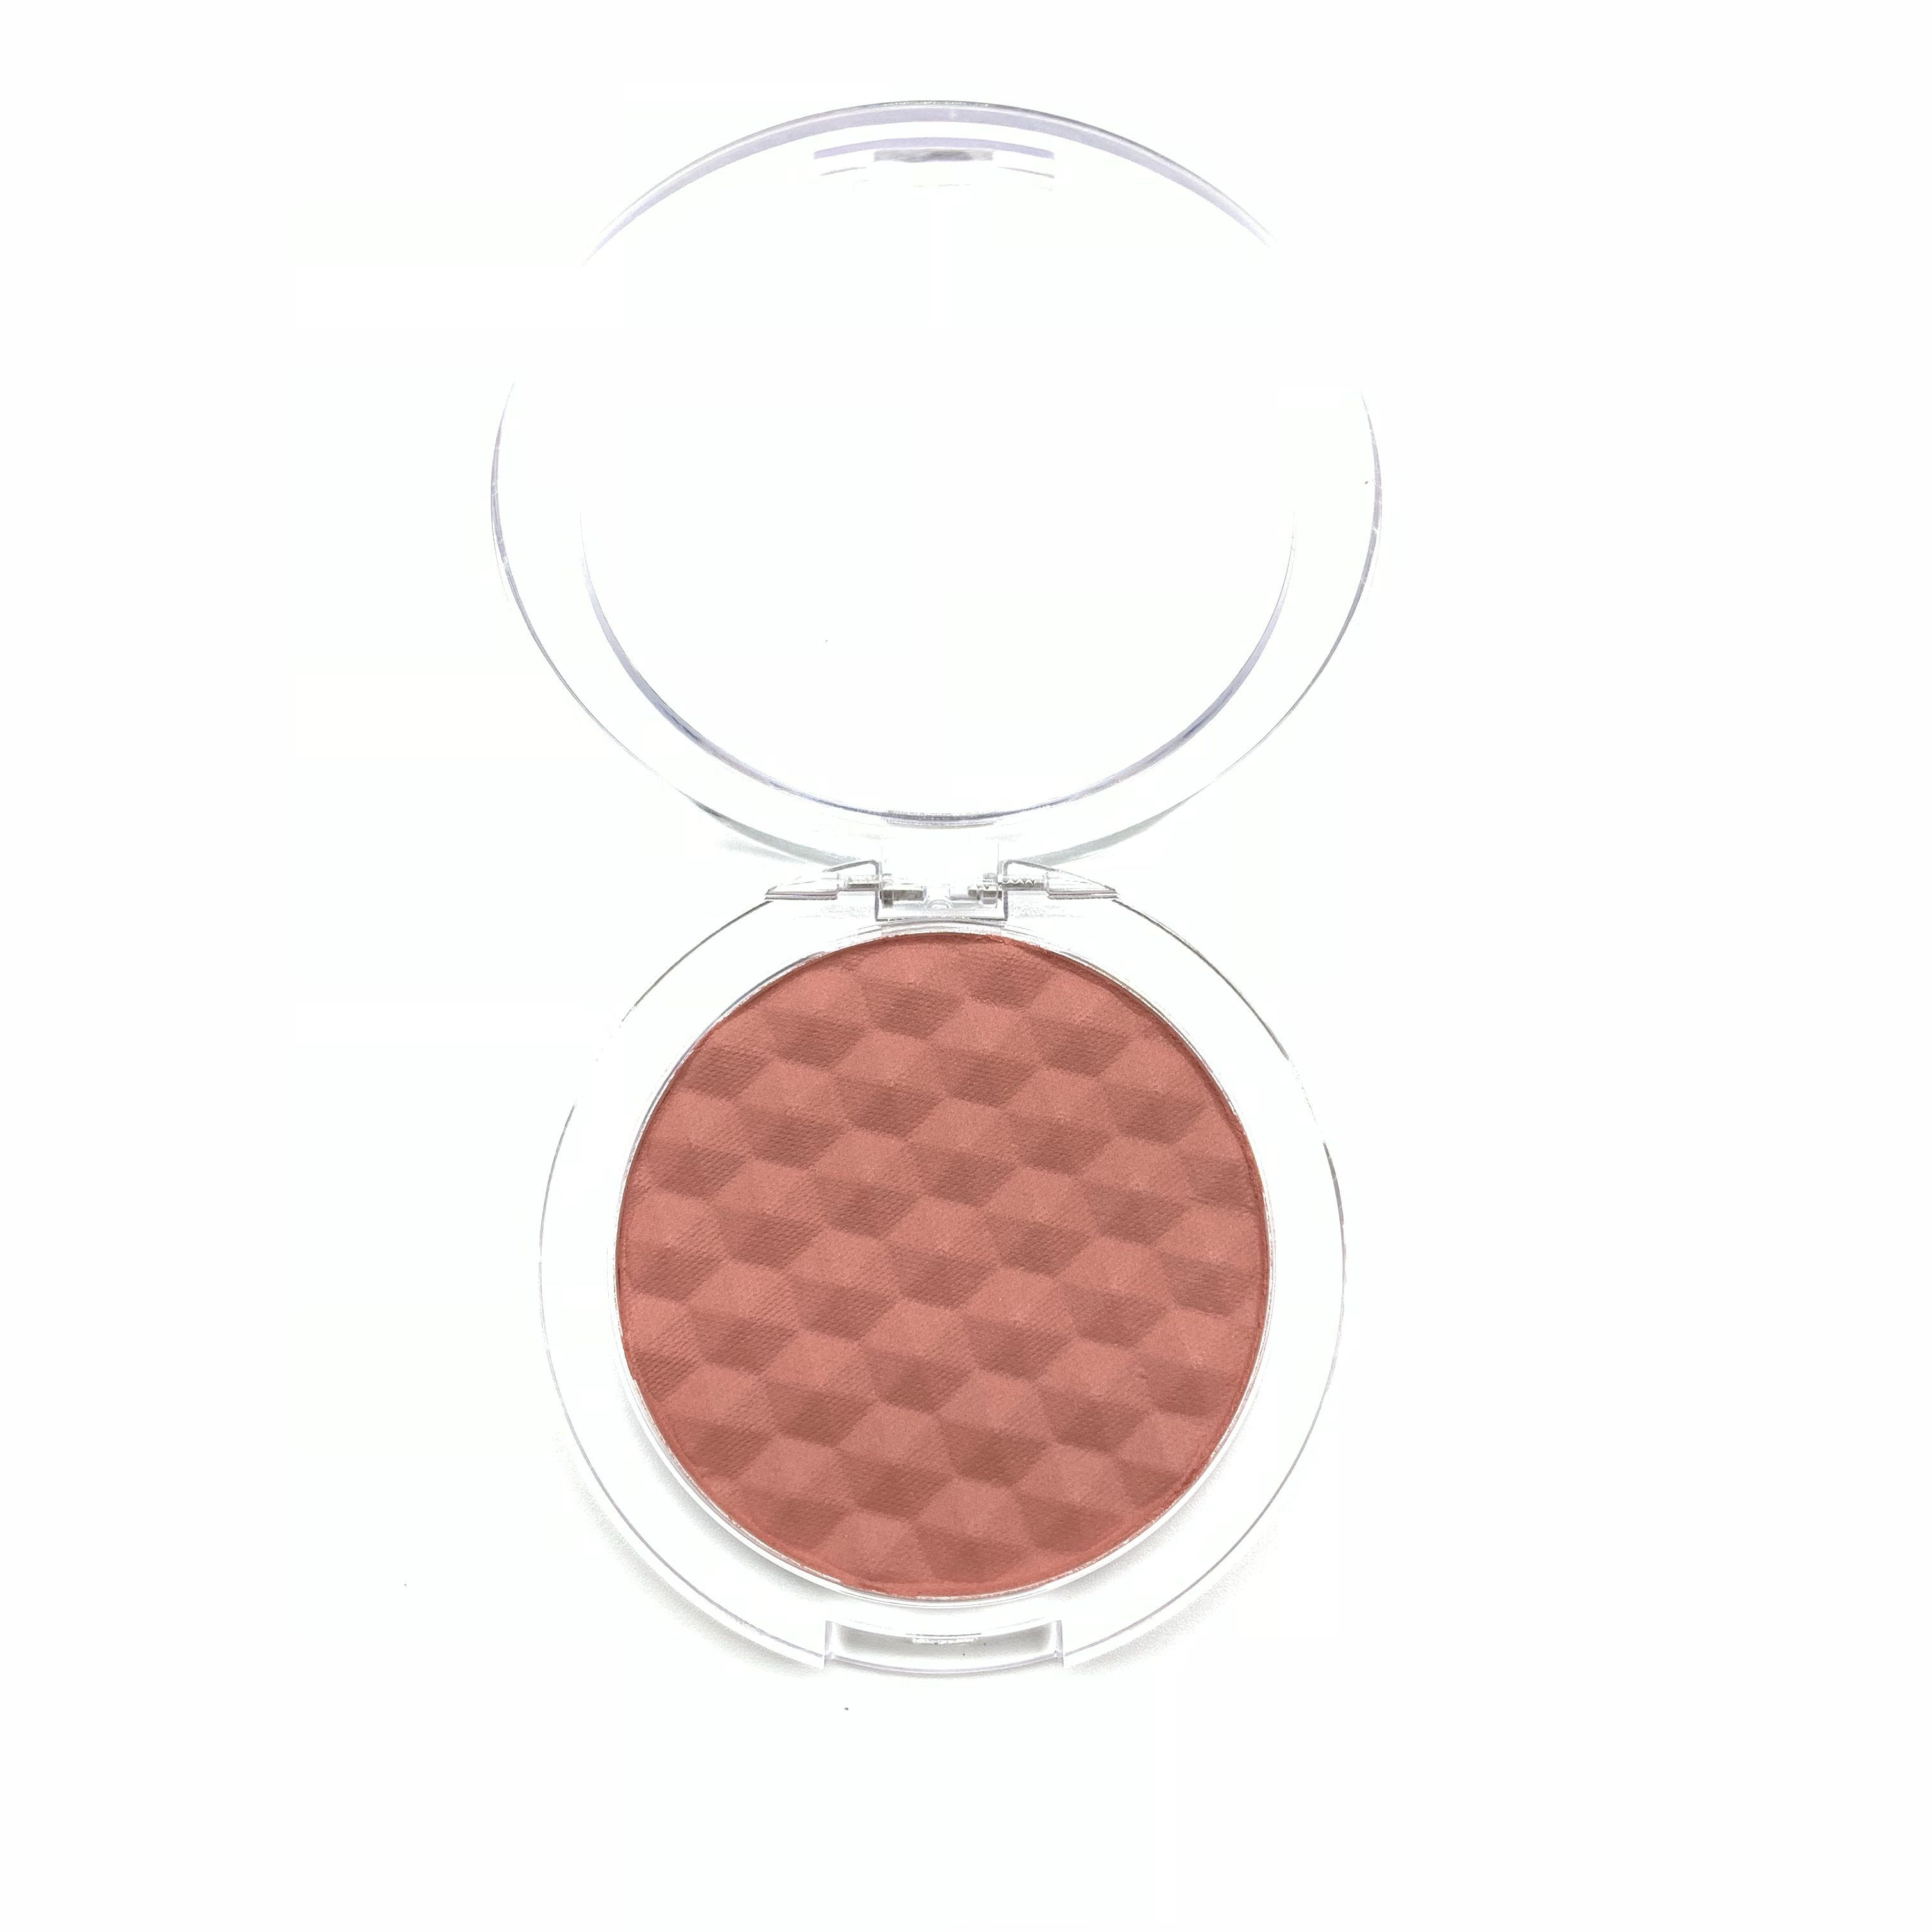 Waterproof Makeup Blush On Custom Private Label Highlighting Press Powder Pink Blush Palette